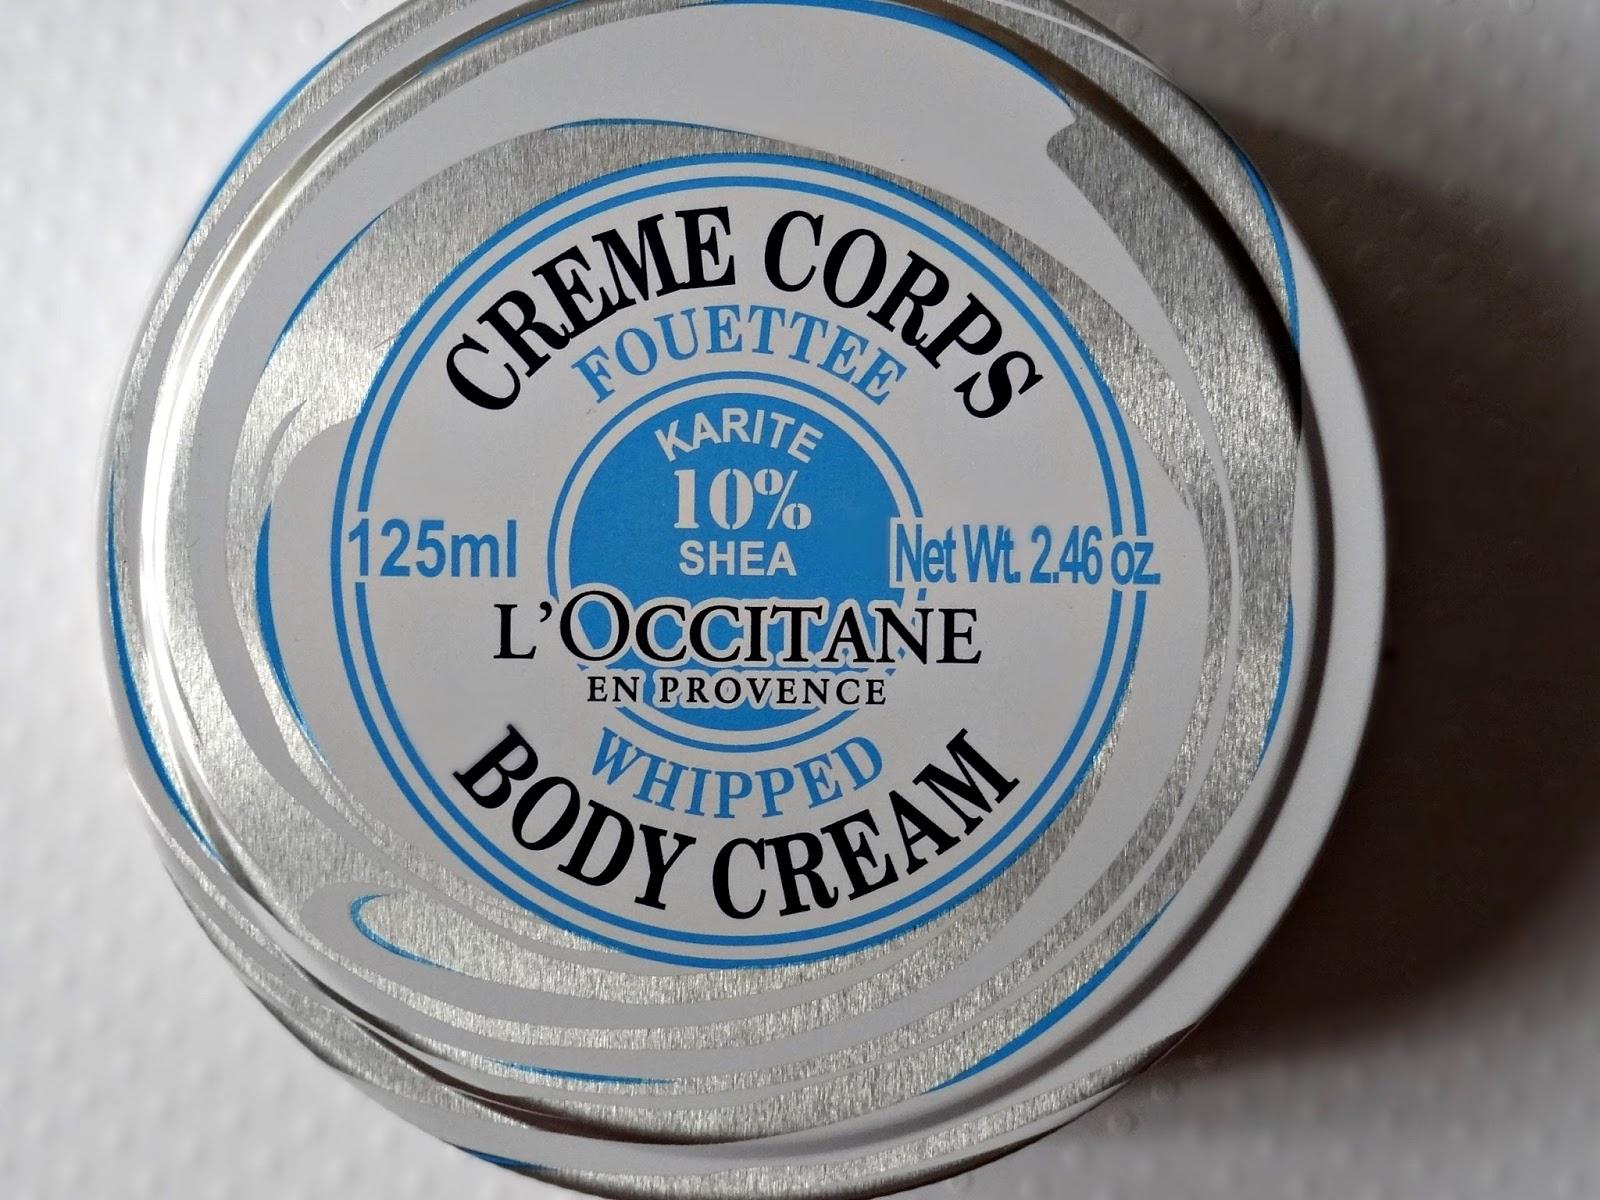 L'Occitane Shea Whipped Body Cream